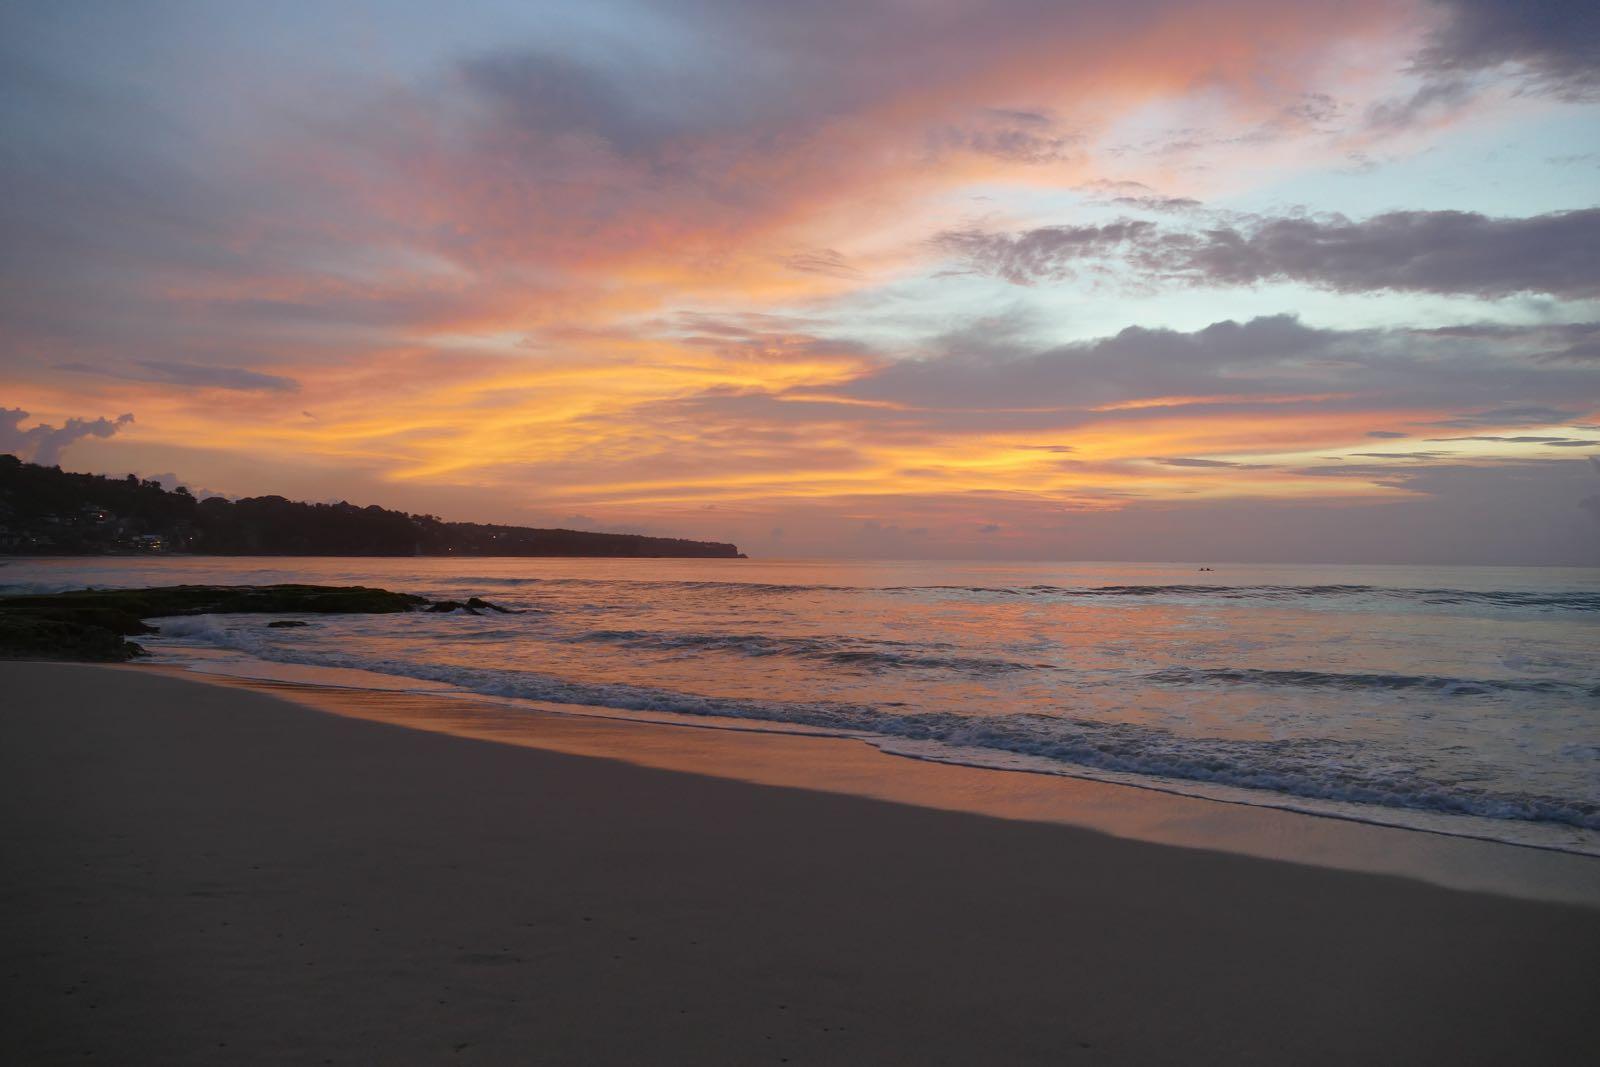 Sonnenuntergang Dreamland Beach, Bali